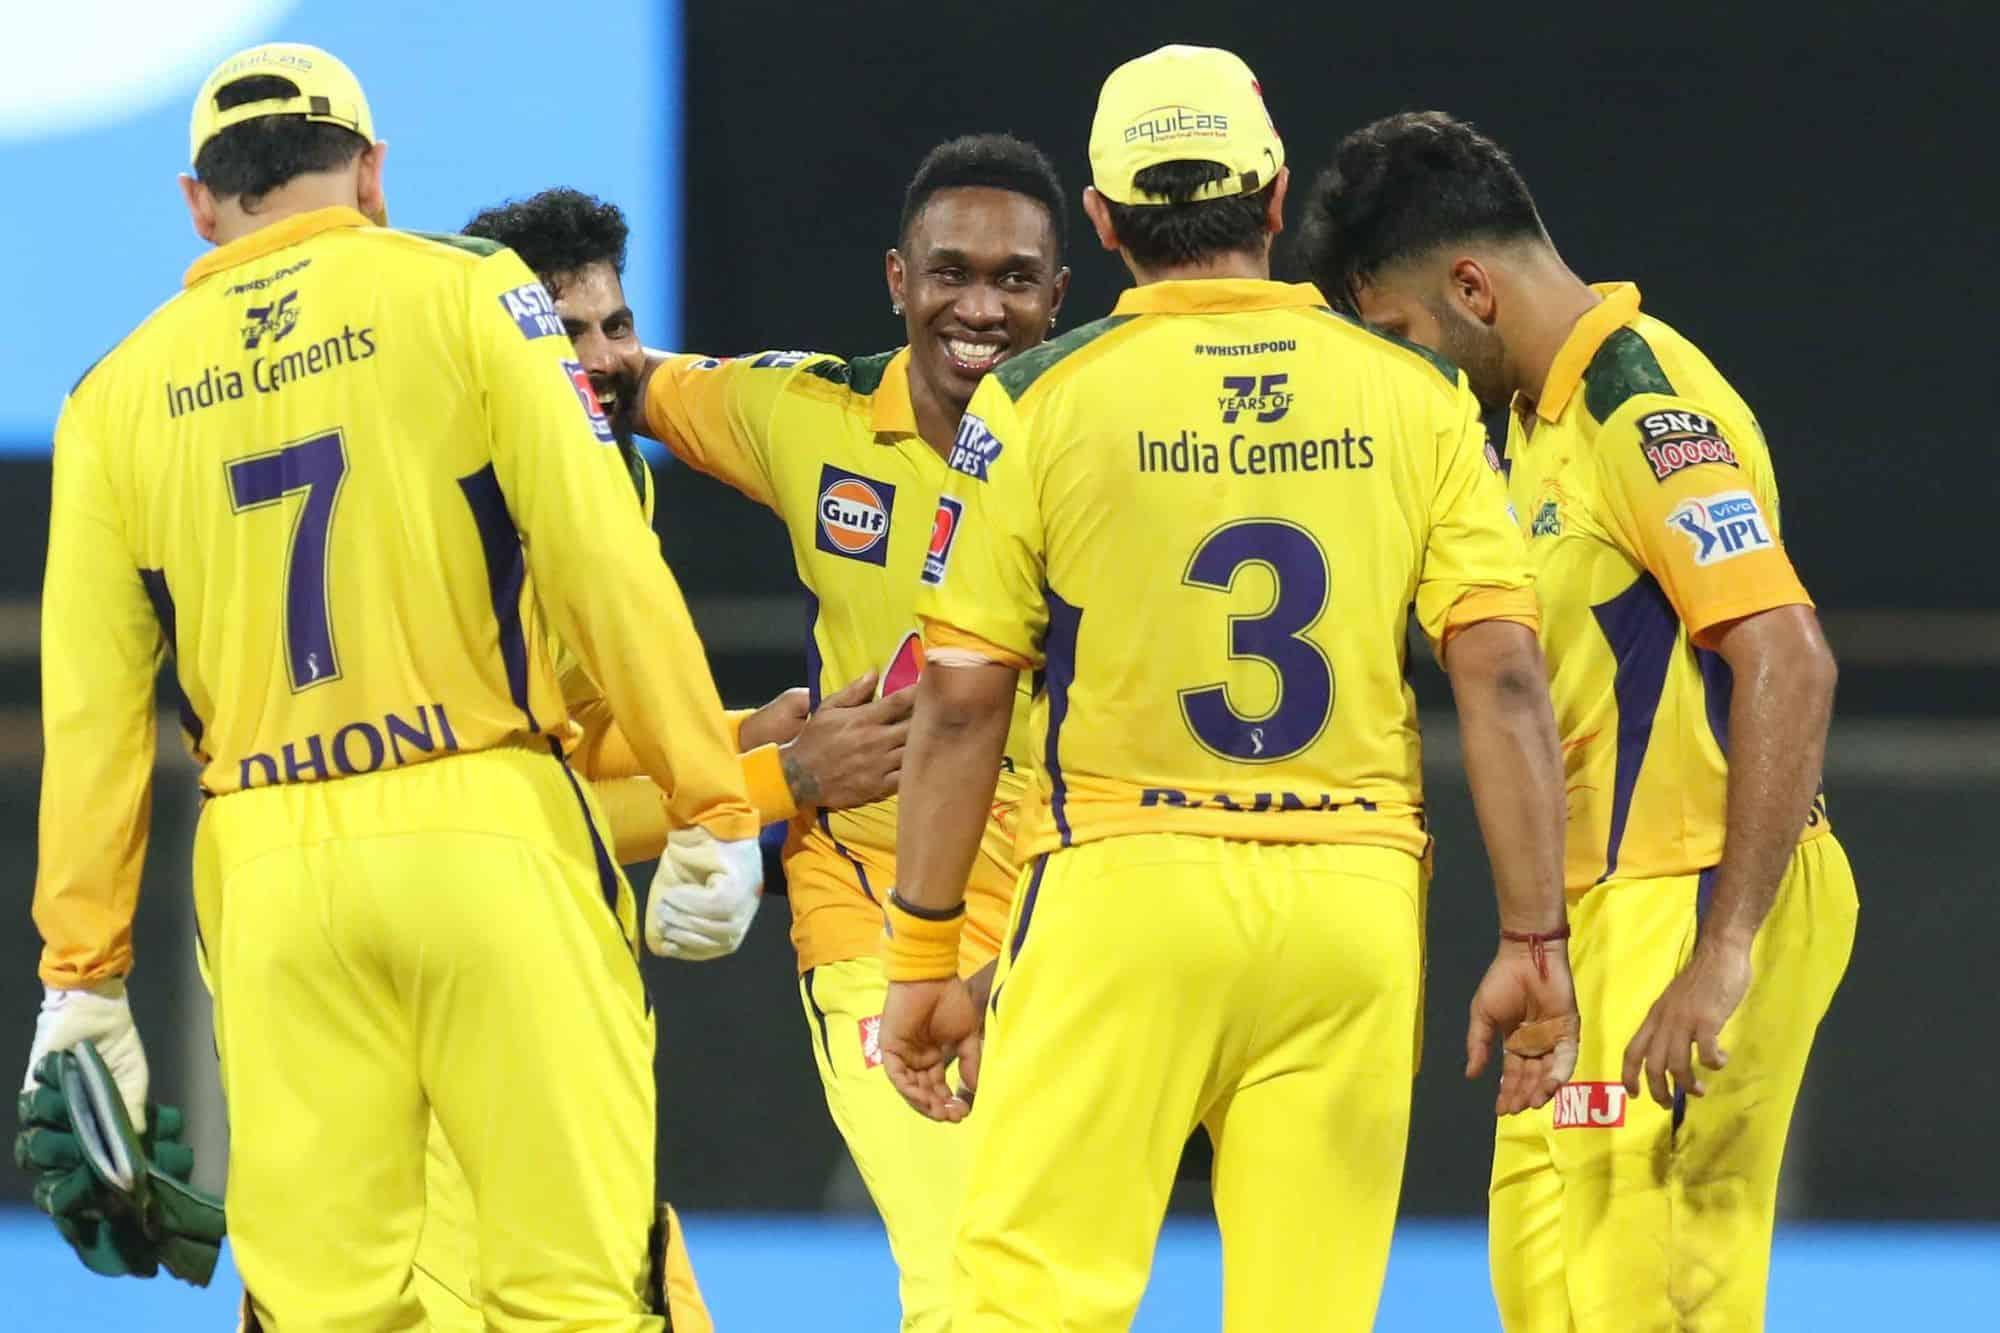 CSK vs RR: Moeen Ali, Ravindra Jadeja Shine As Chennai Super Kings Choke Rajasthan Royals With Spin - Match 12, IPL 2021